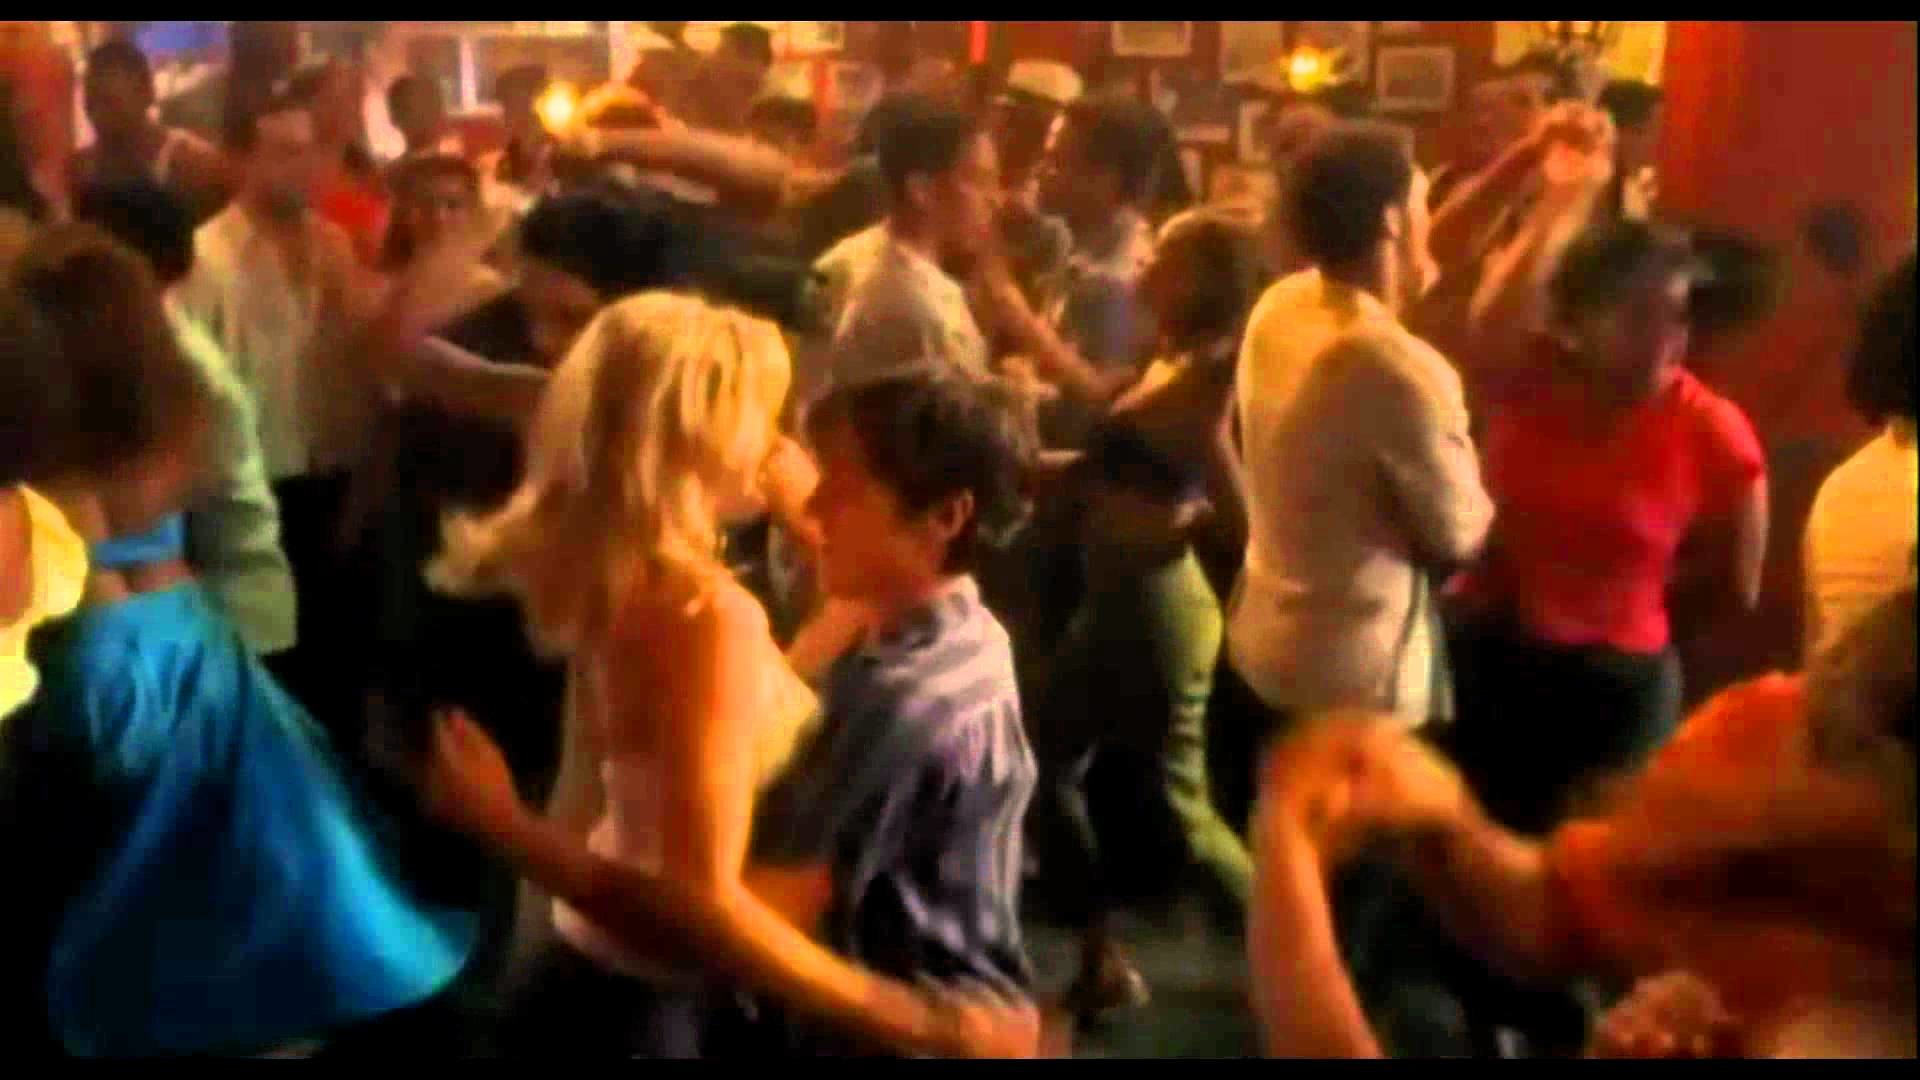 Res: 1920x1080, Dance Movies Collab Part 2-Dirty Dancing 2 Havana Nights.avi